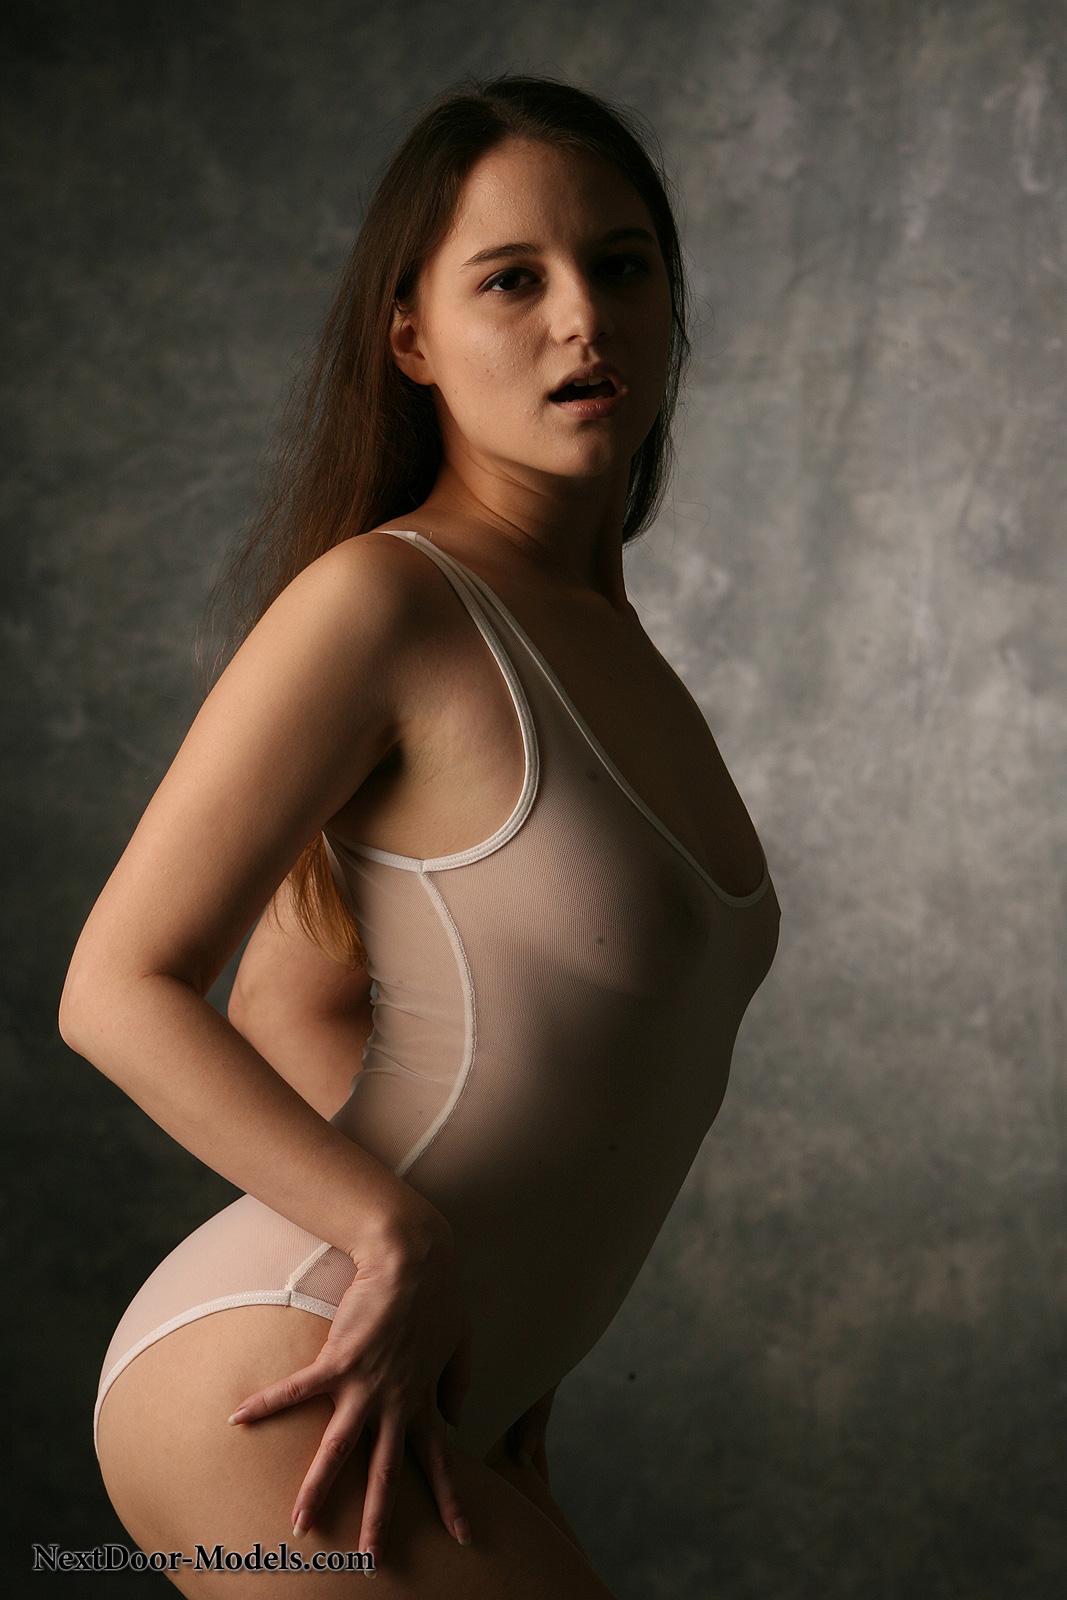 Redhead orgy sex